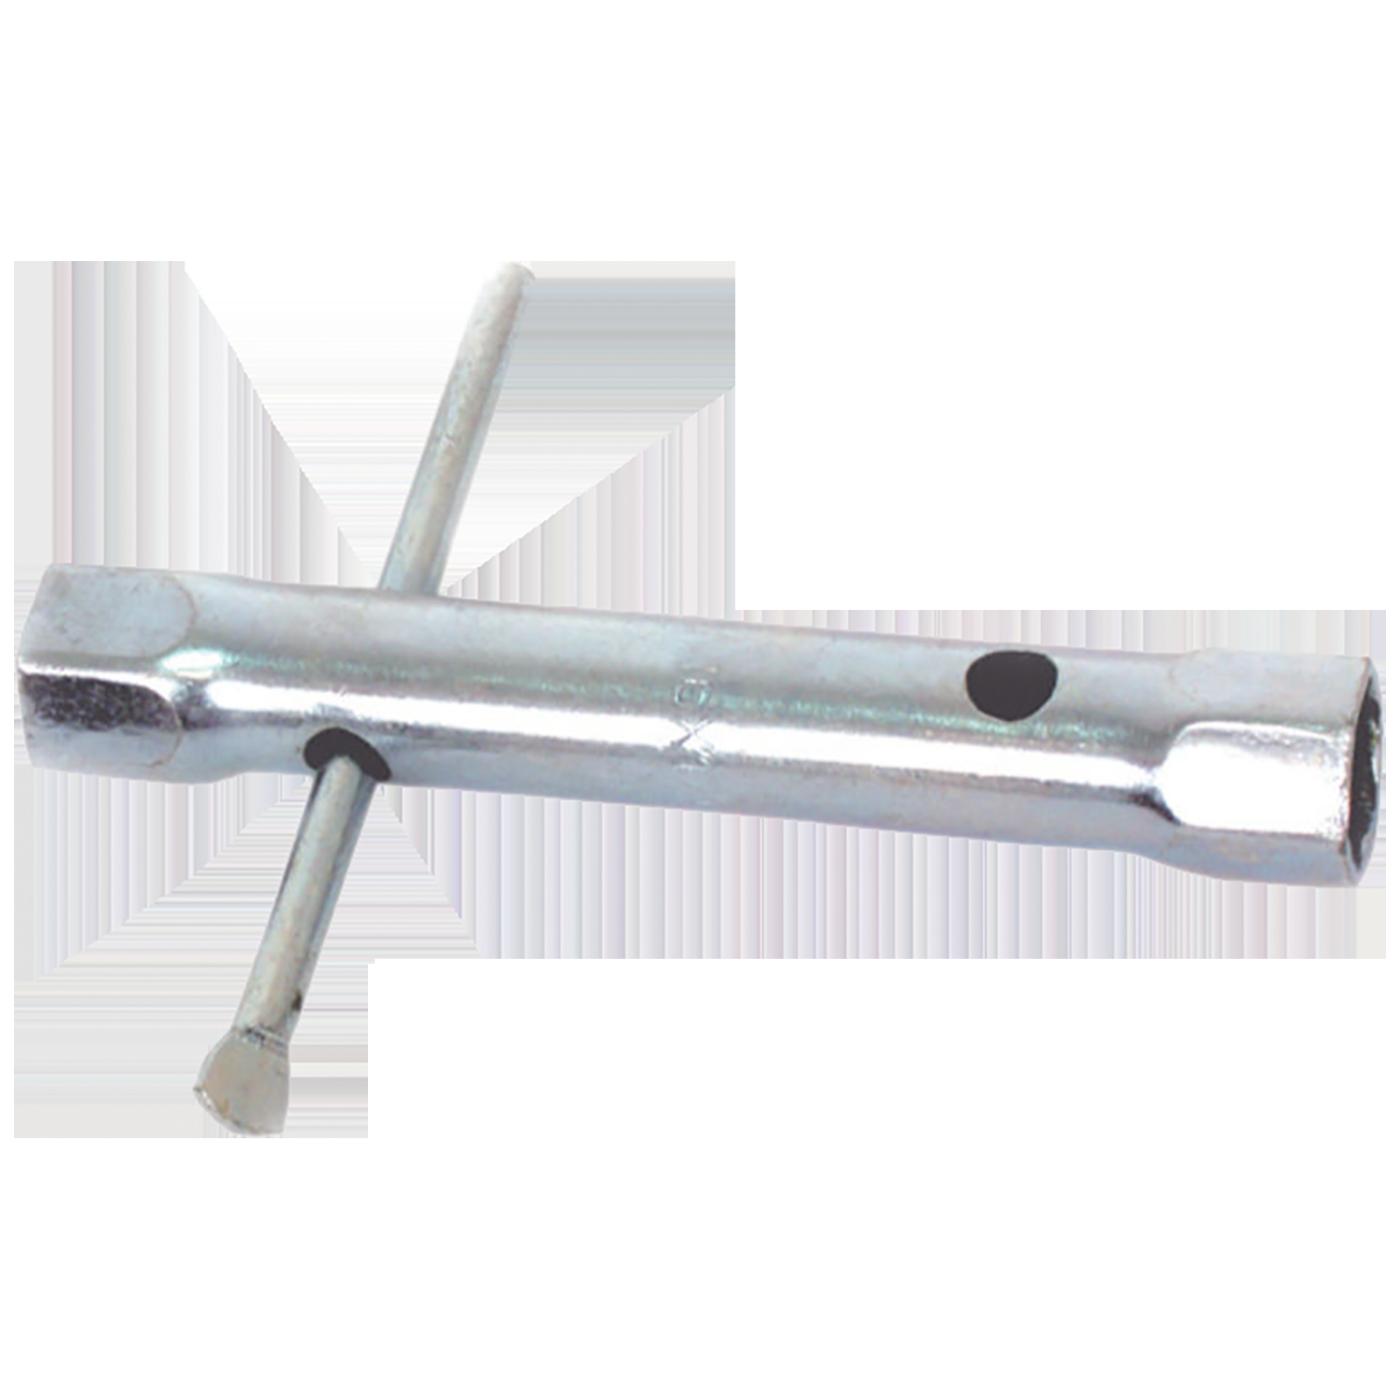 Ključ cjevasti sa šipkom, 10 x 11 mm